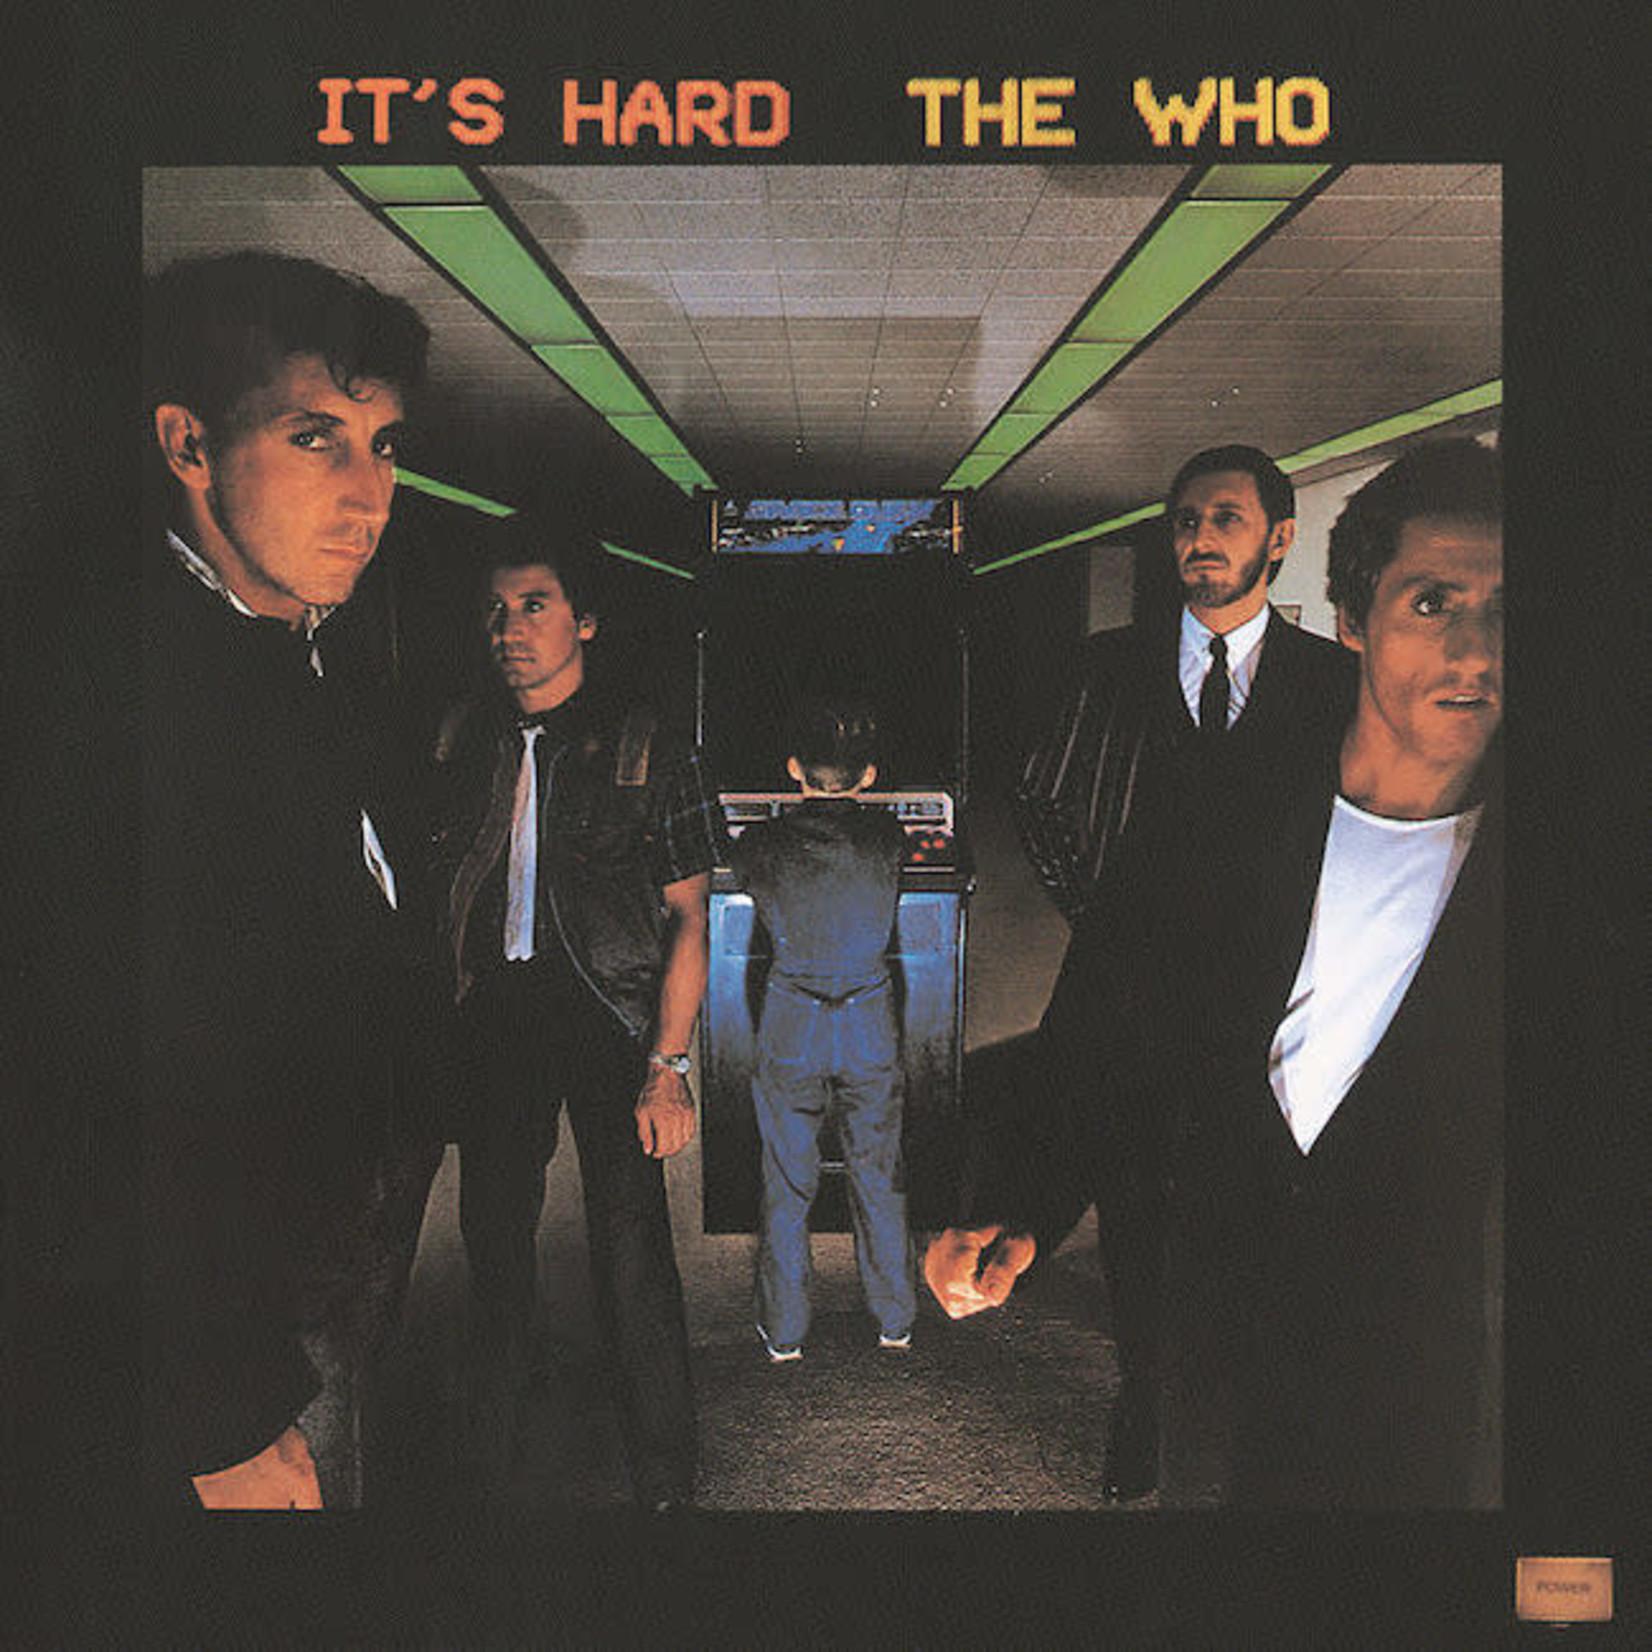 [Vintage] Who: It's Hard